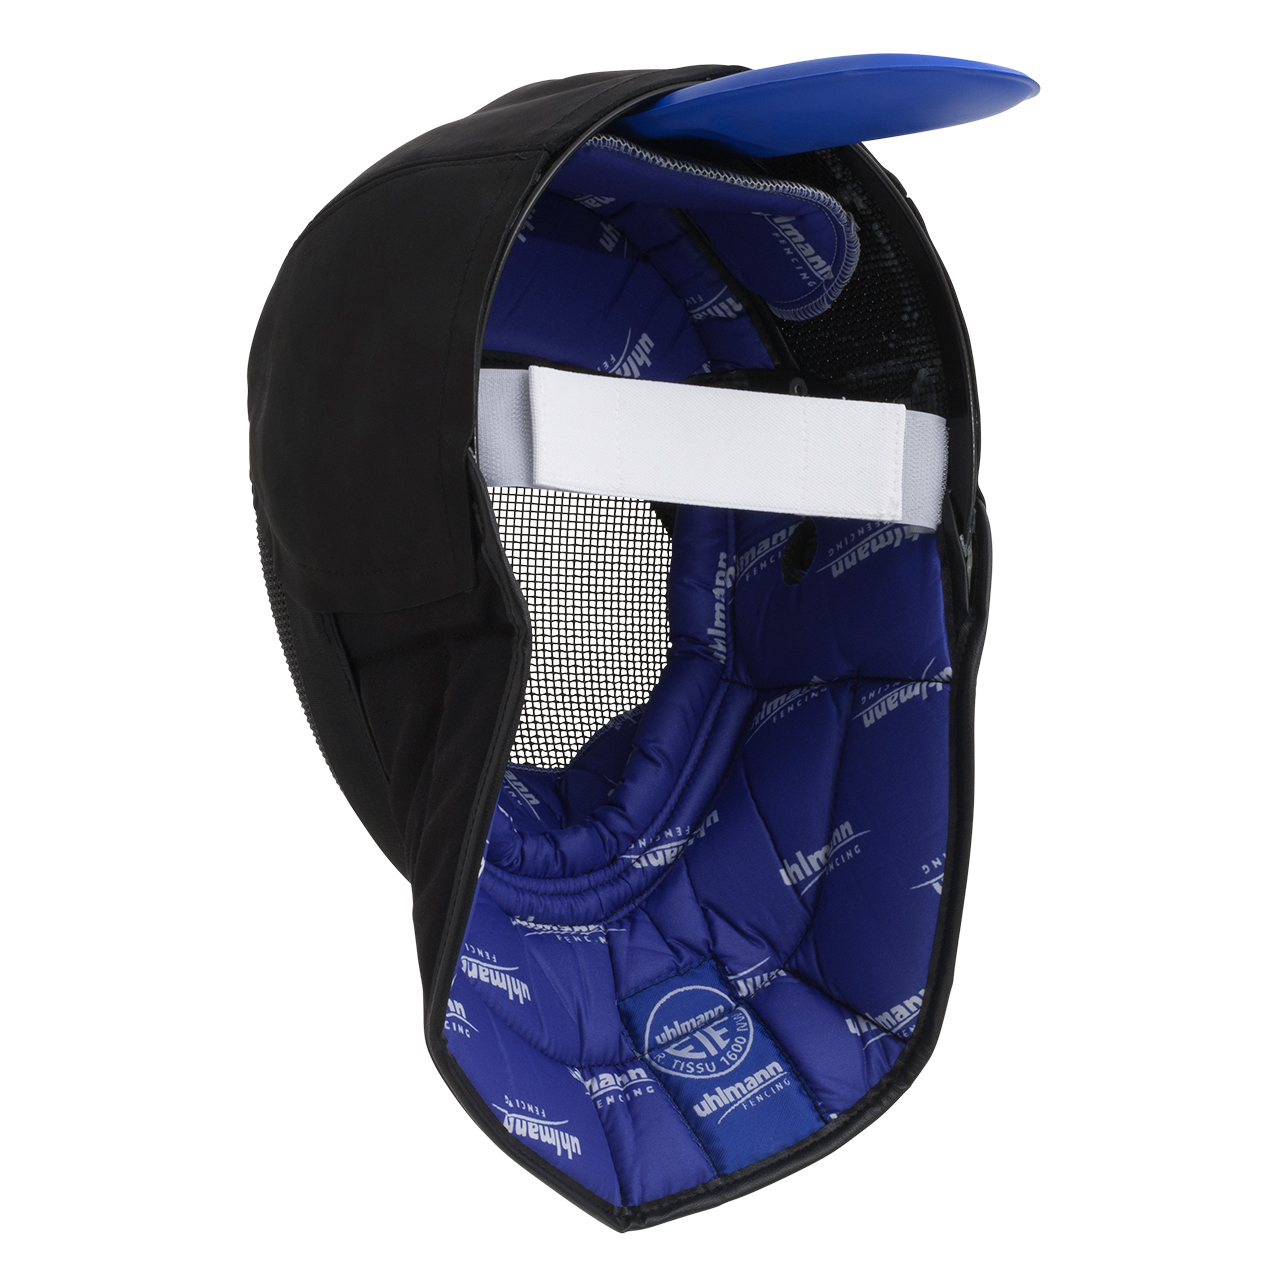 Fechtmeistermaske mit Lederbesatz 1600N